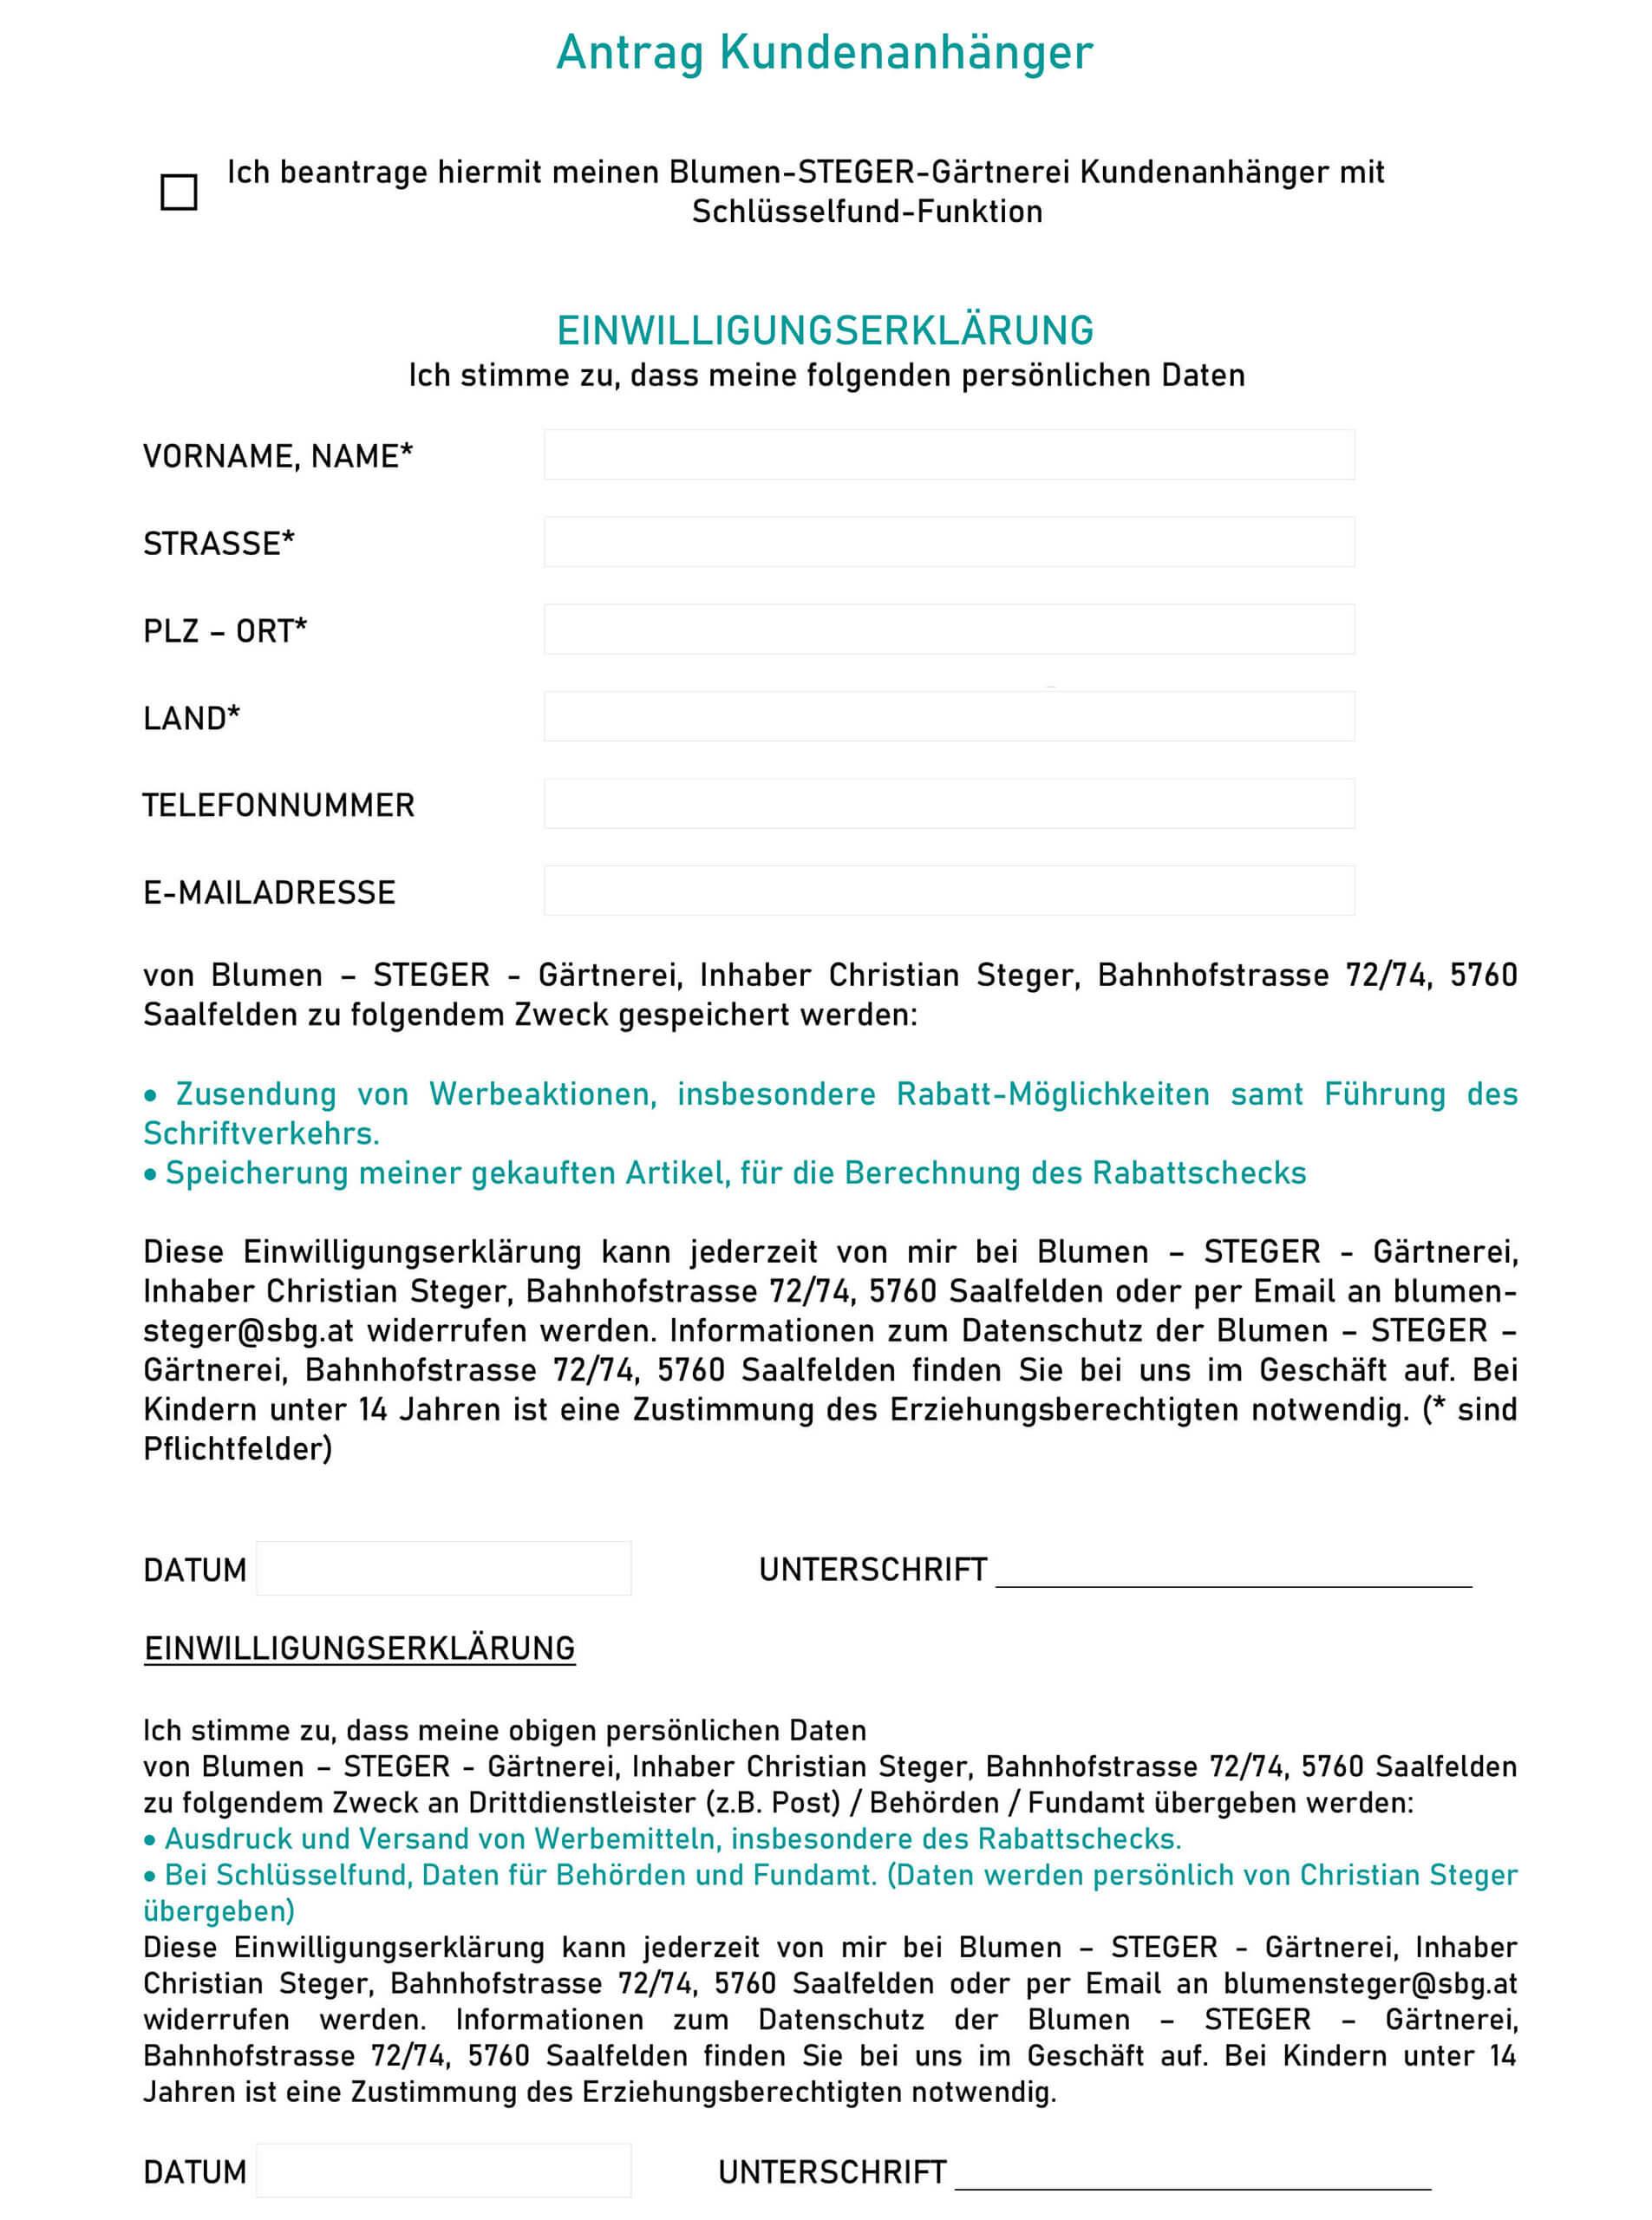 Formular_Kundenanhaenger-Blumen-Steger-Saalfelden-Bruck